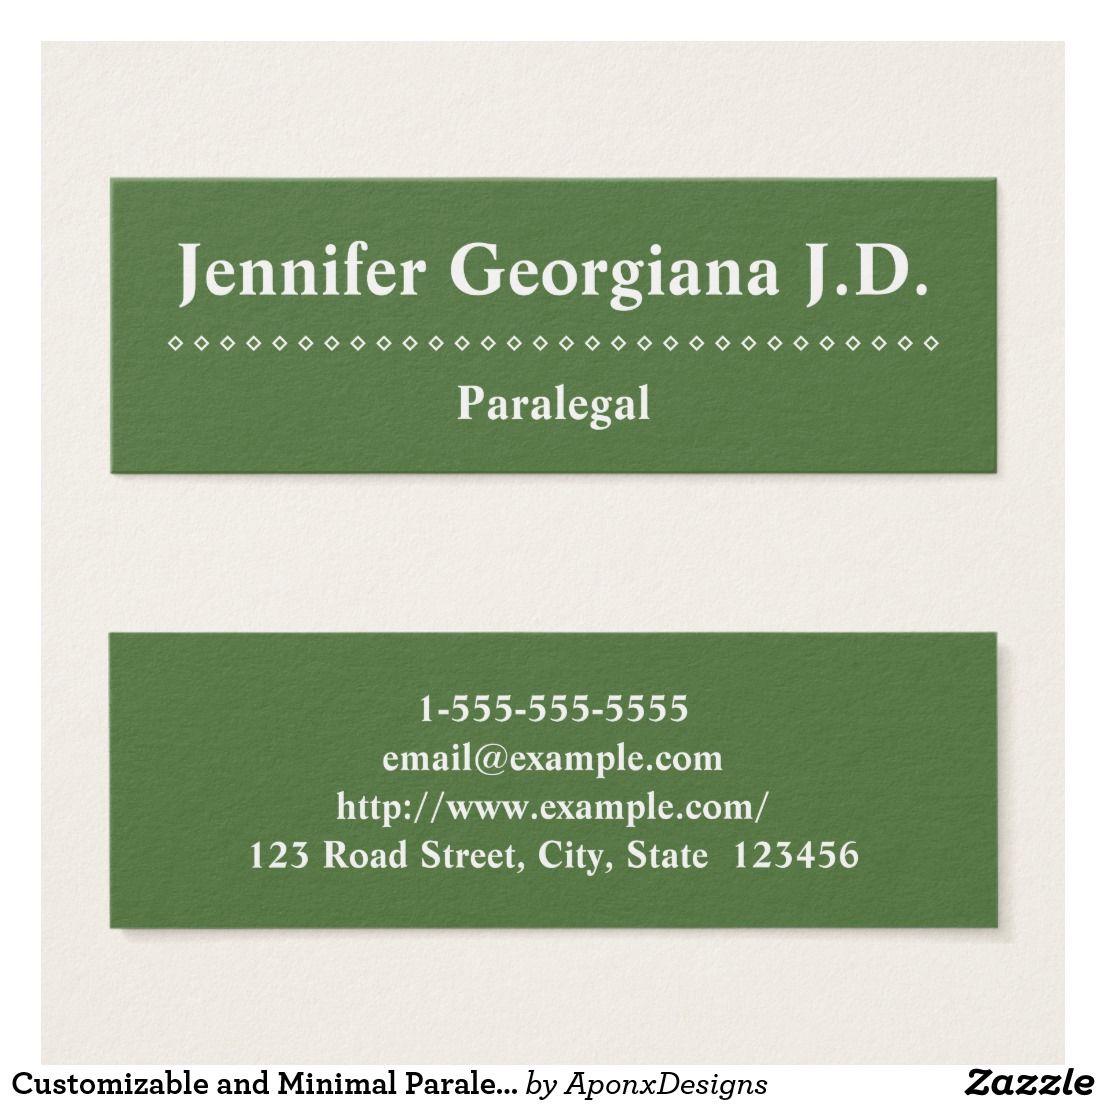 Customizable and minimal paralegal business card colourmoves